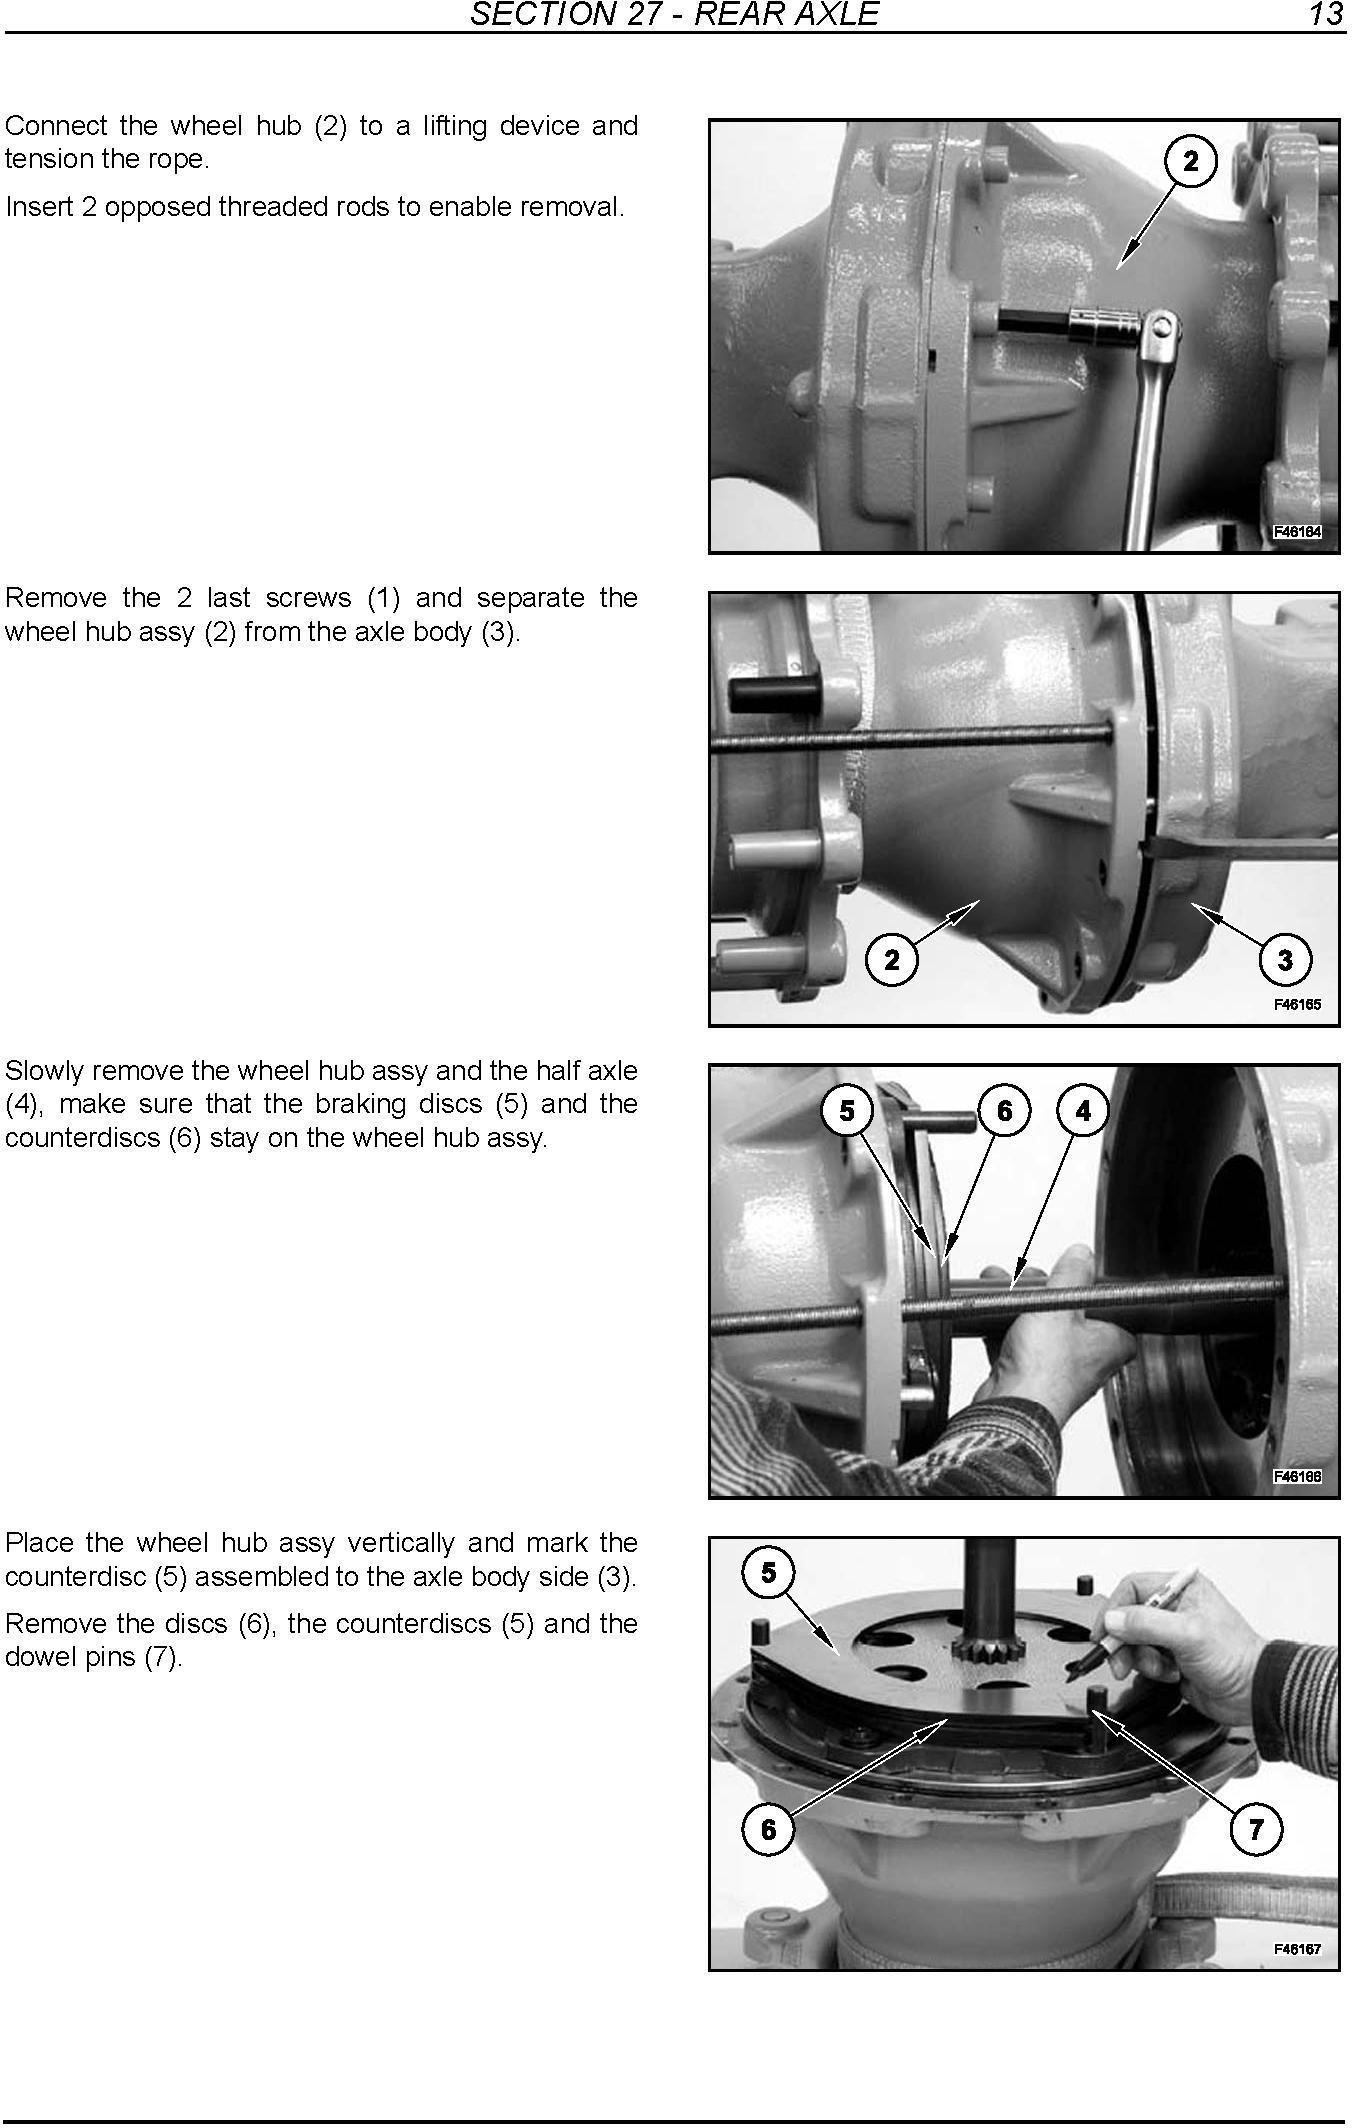 New Holland B90B, B95B, B95BLR, B95BTC, B110B, B115B Backhoe Loader Tier 3 Service Manual - 1